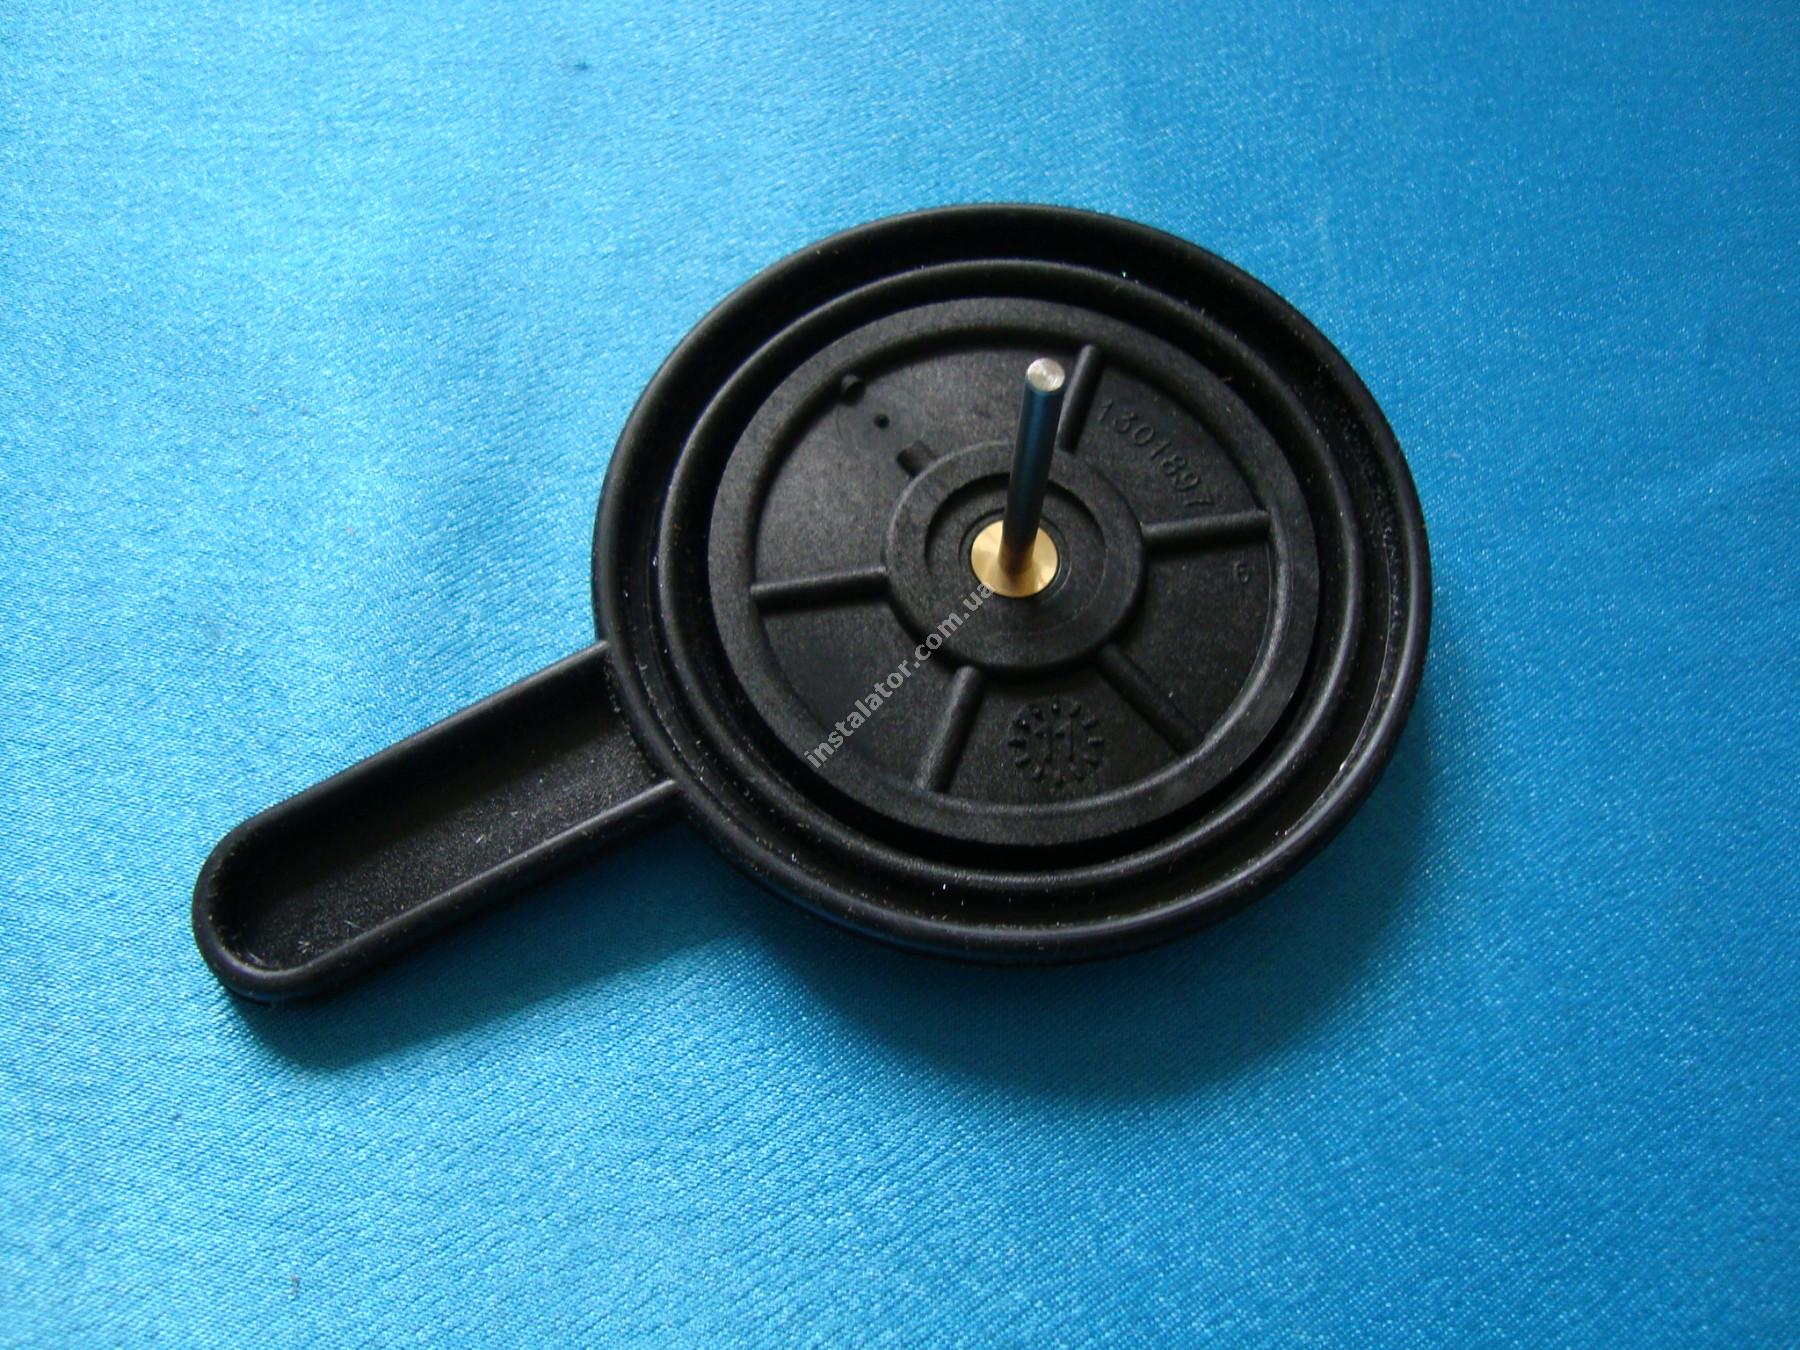 60081977 Ремкомплект мембрани 3-х ходового клапана CHAFFOTEAUX ELEXIA full-image-3